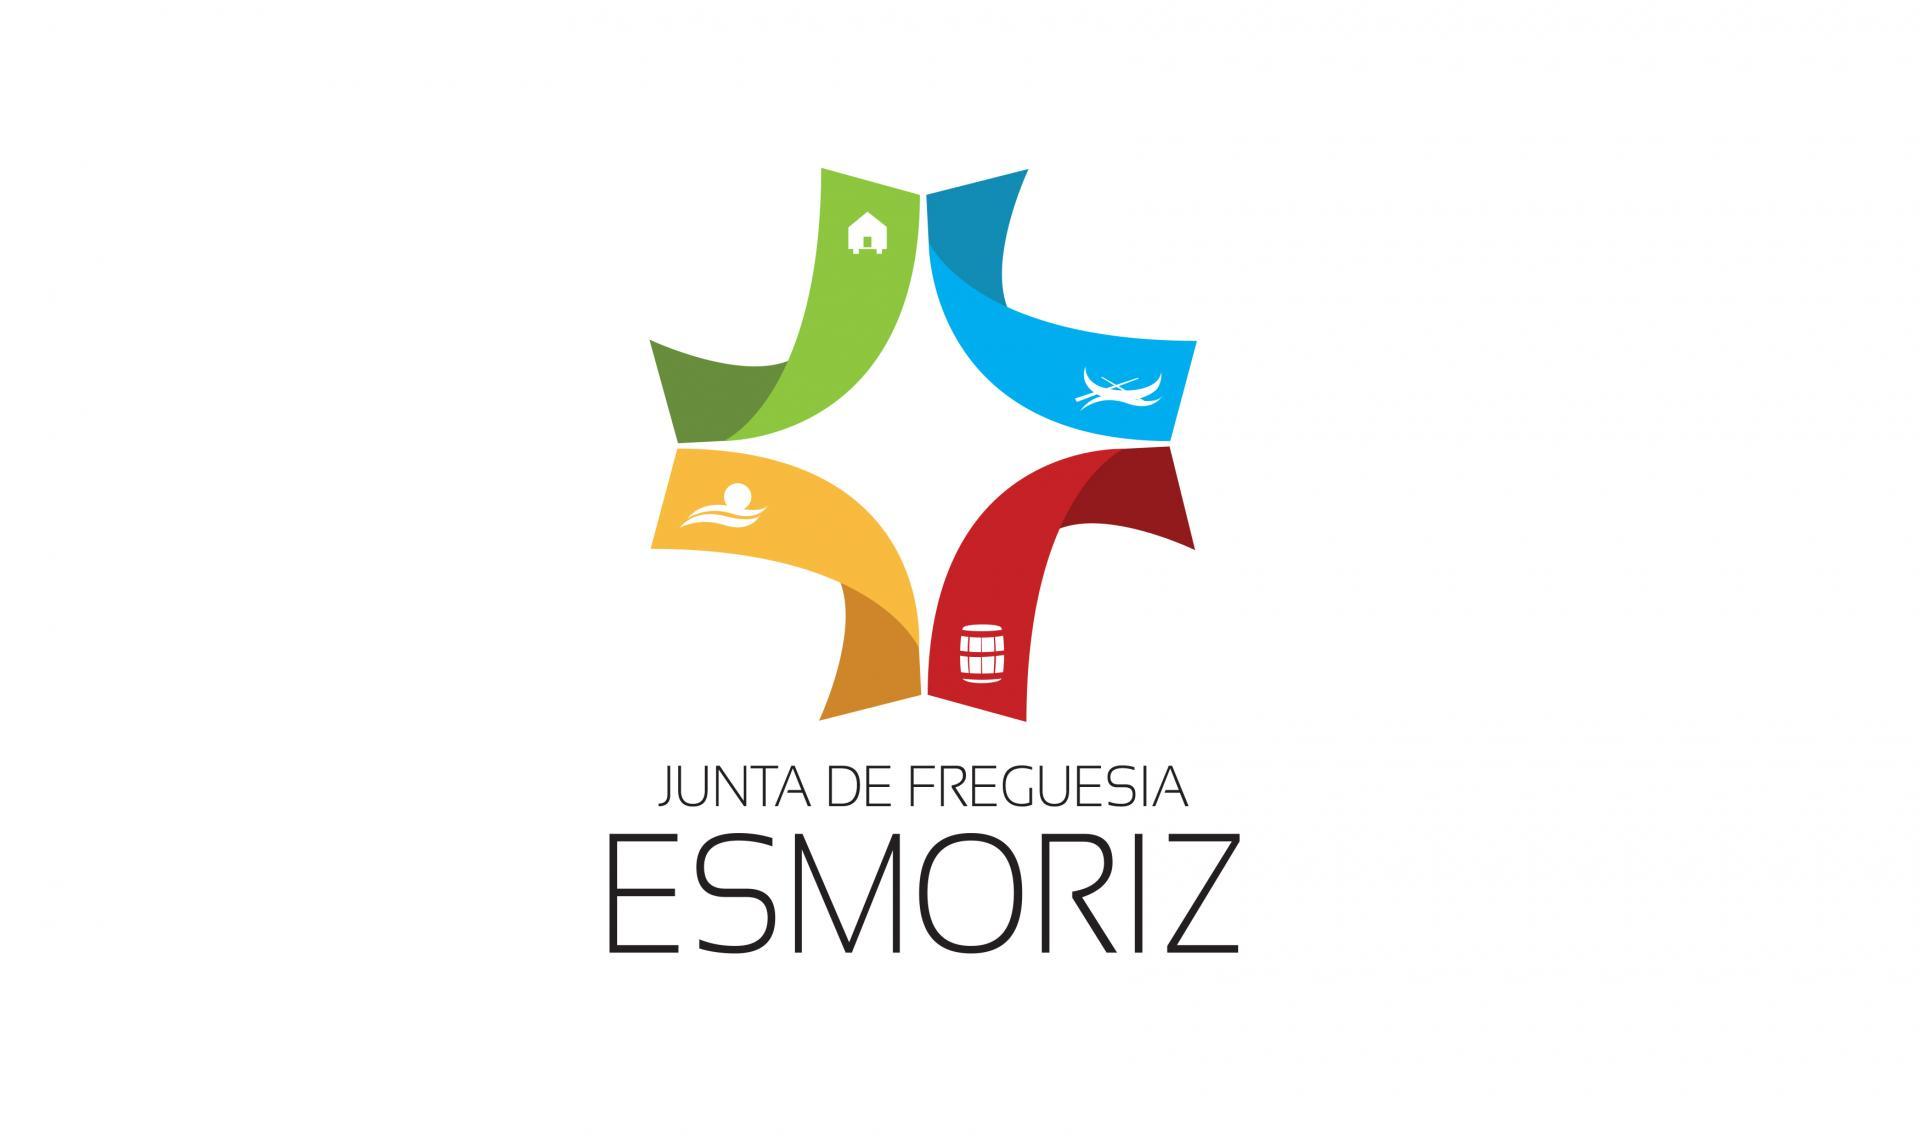 Junta de Freguesia de Esmoriz